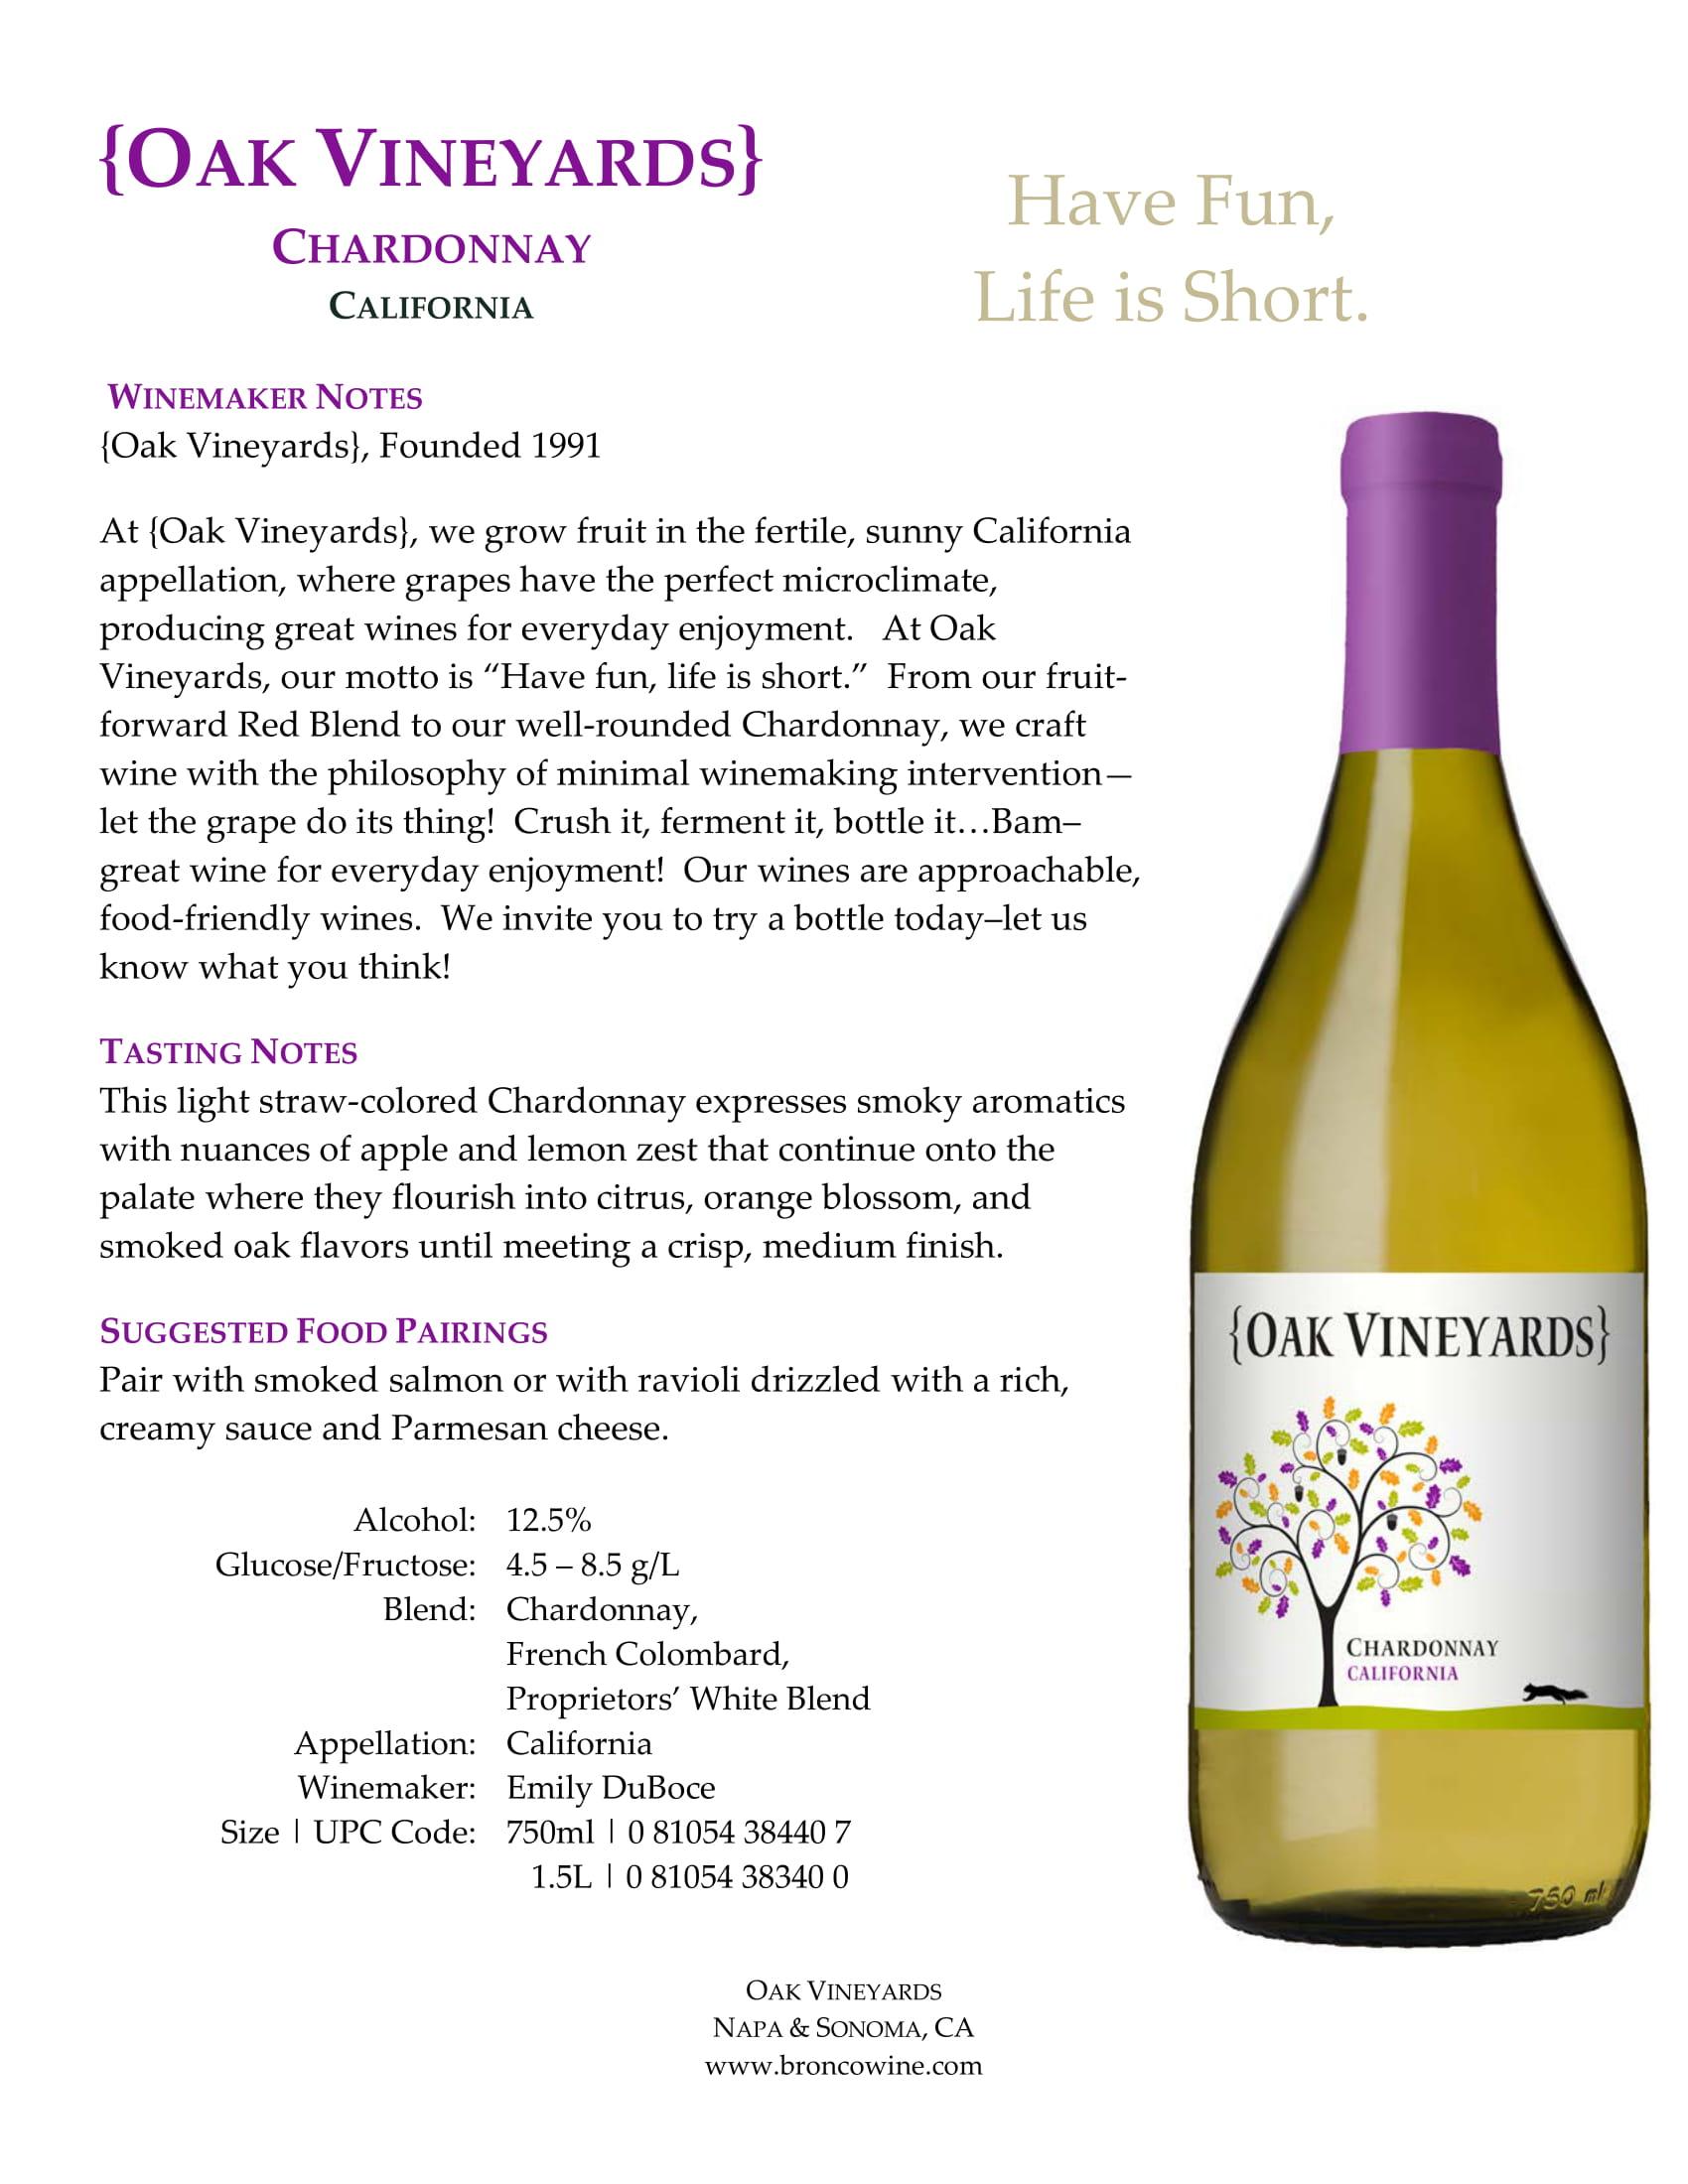 Oak Vineyards Chardonnay Tech Sheet